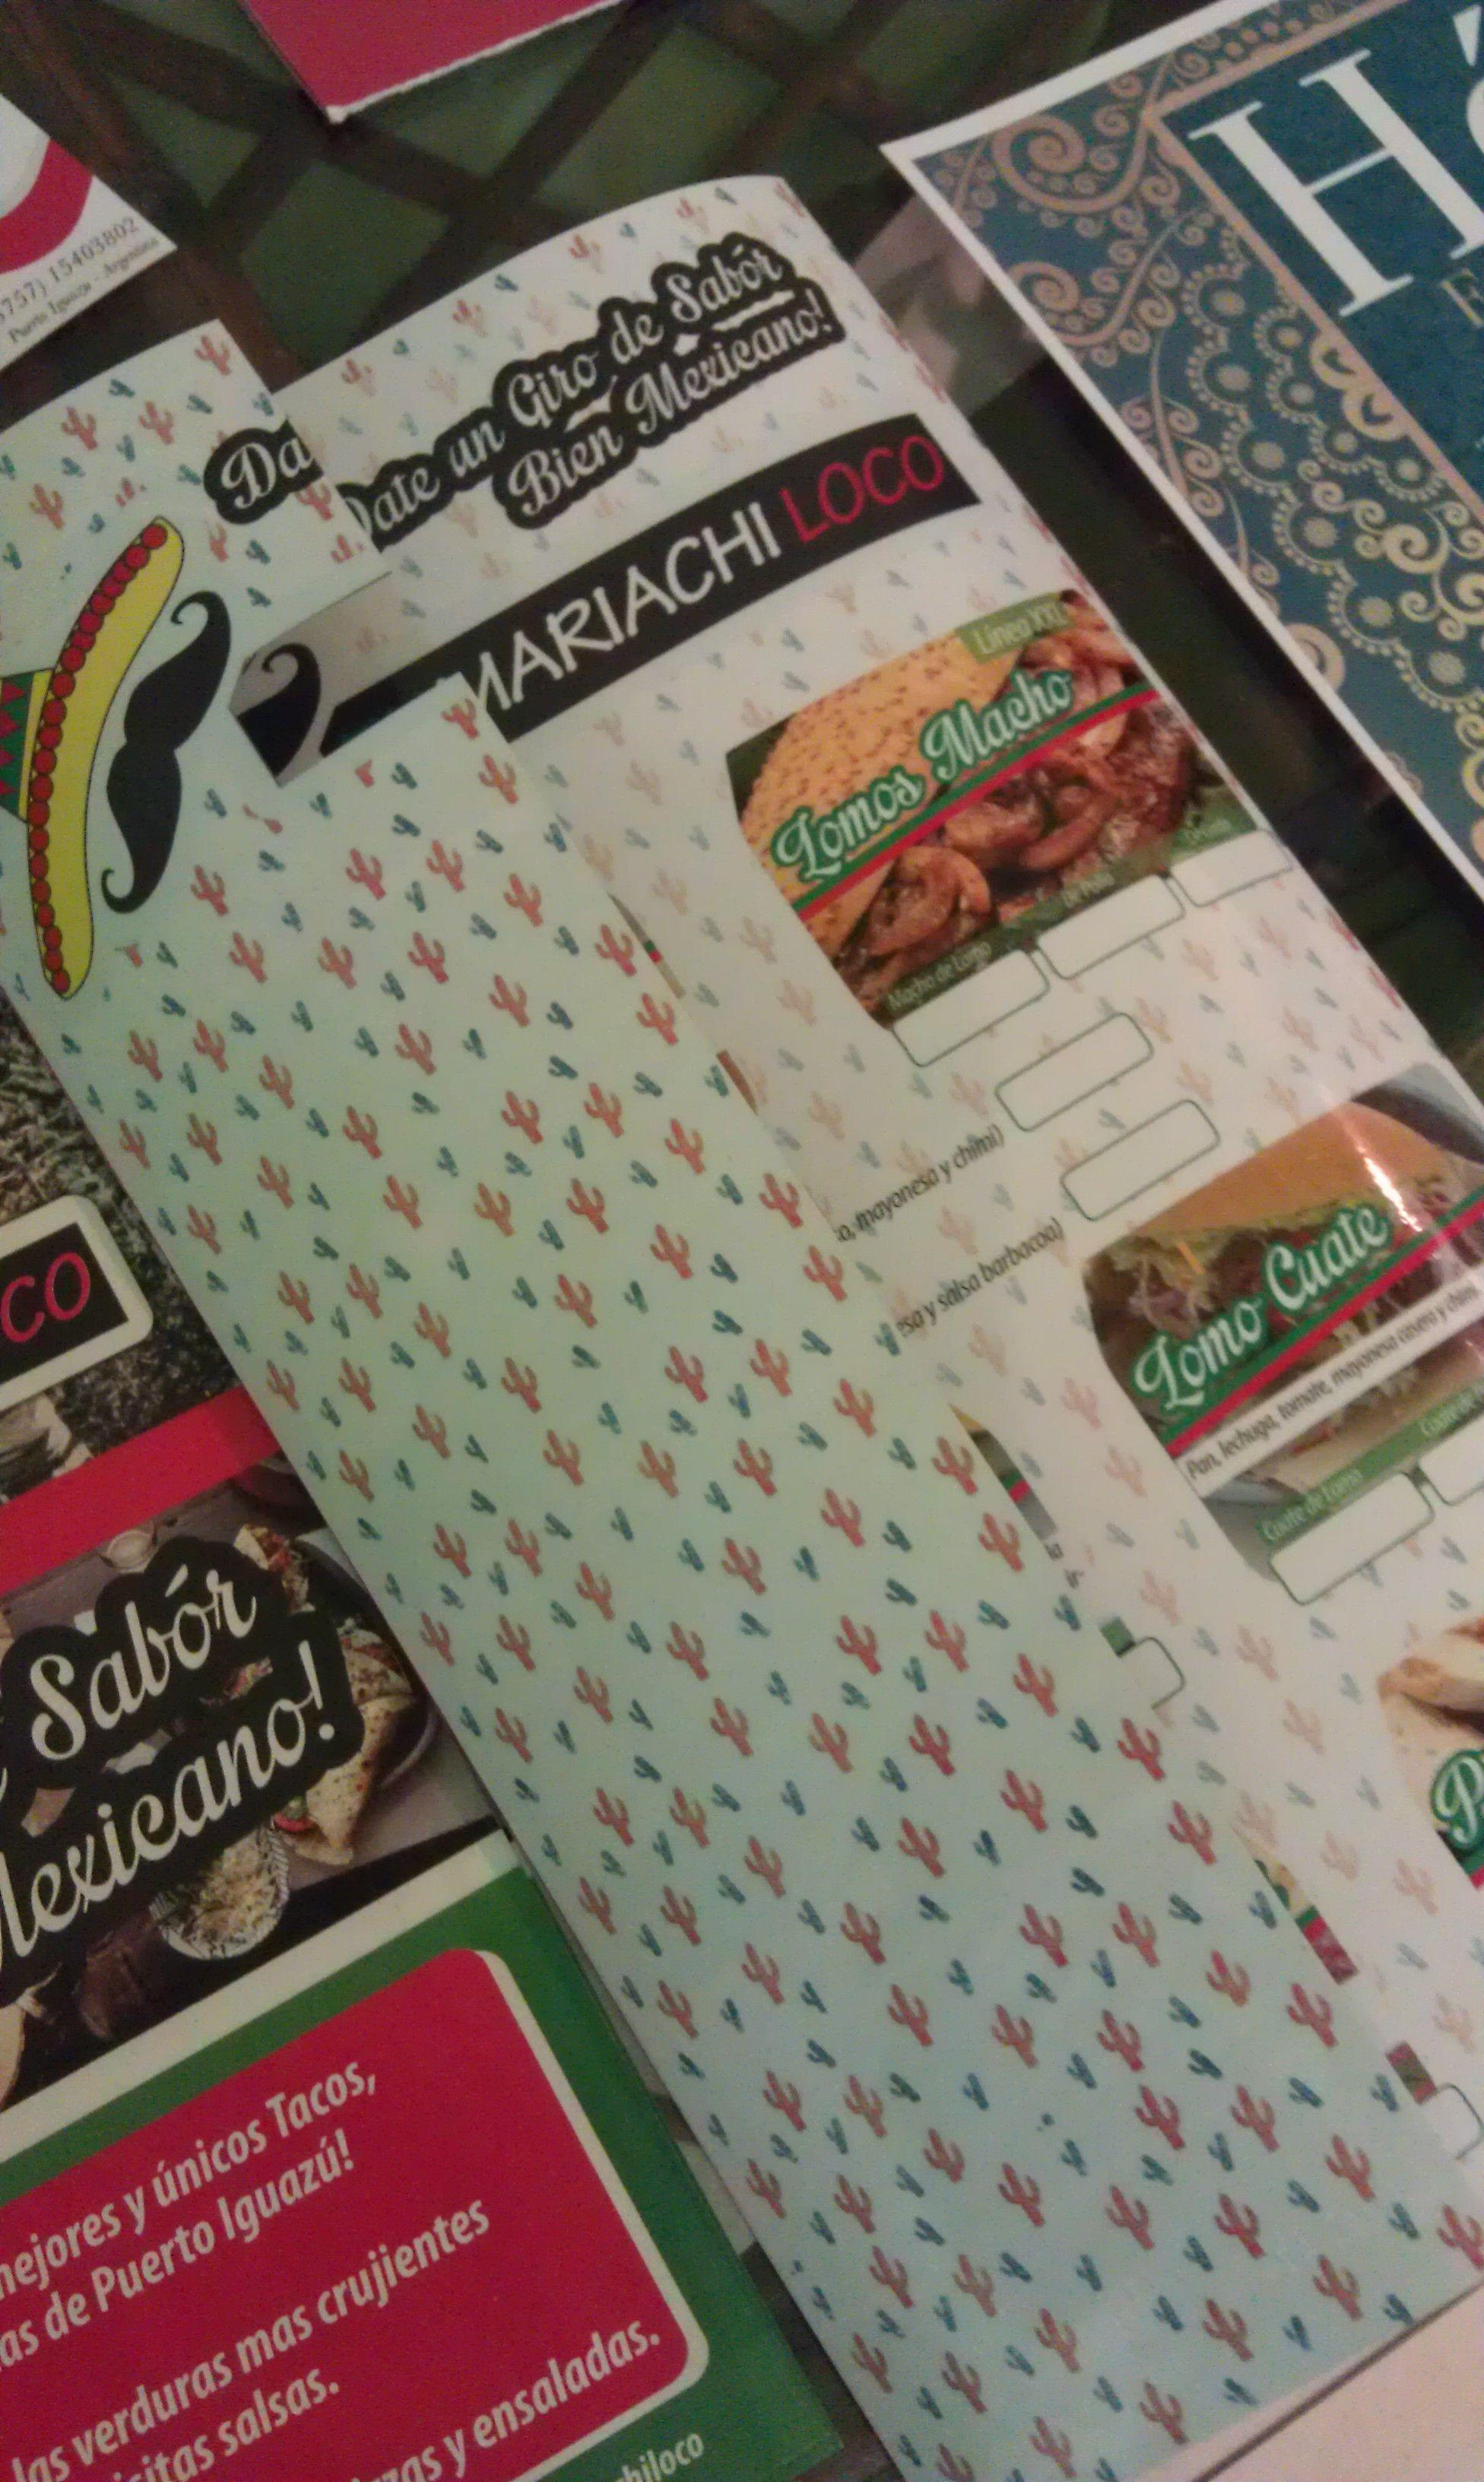 #iguazu #mariachiloco #comidamexicana #mexicanfood #argentina